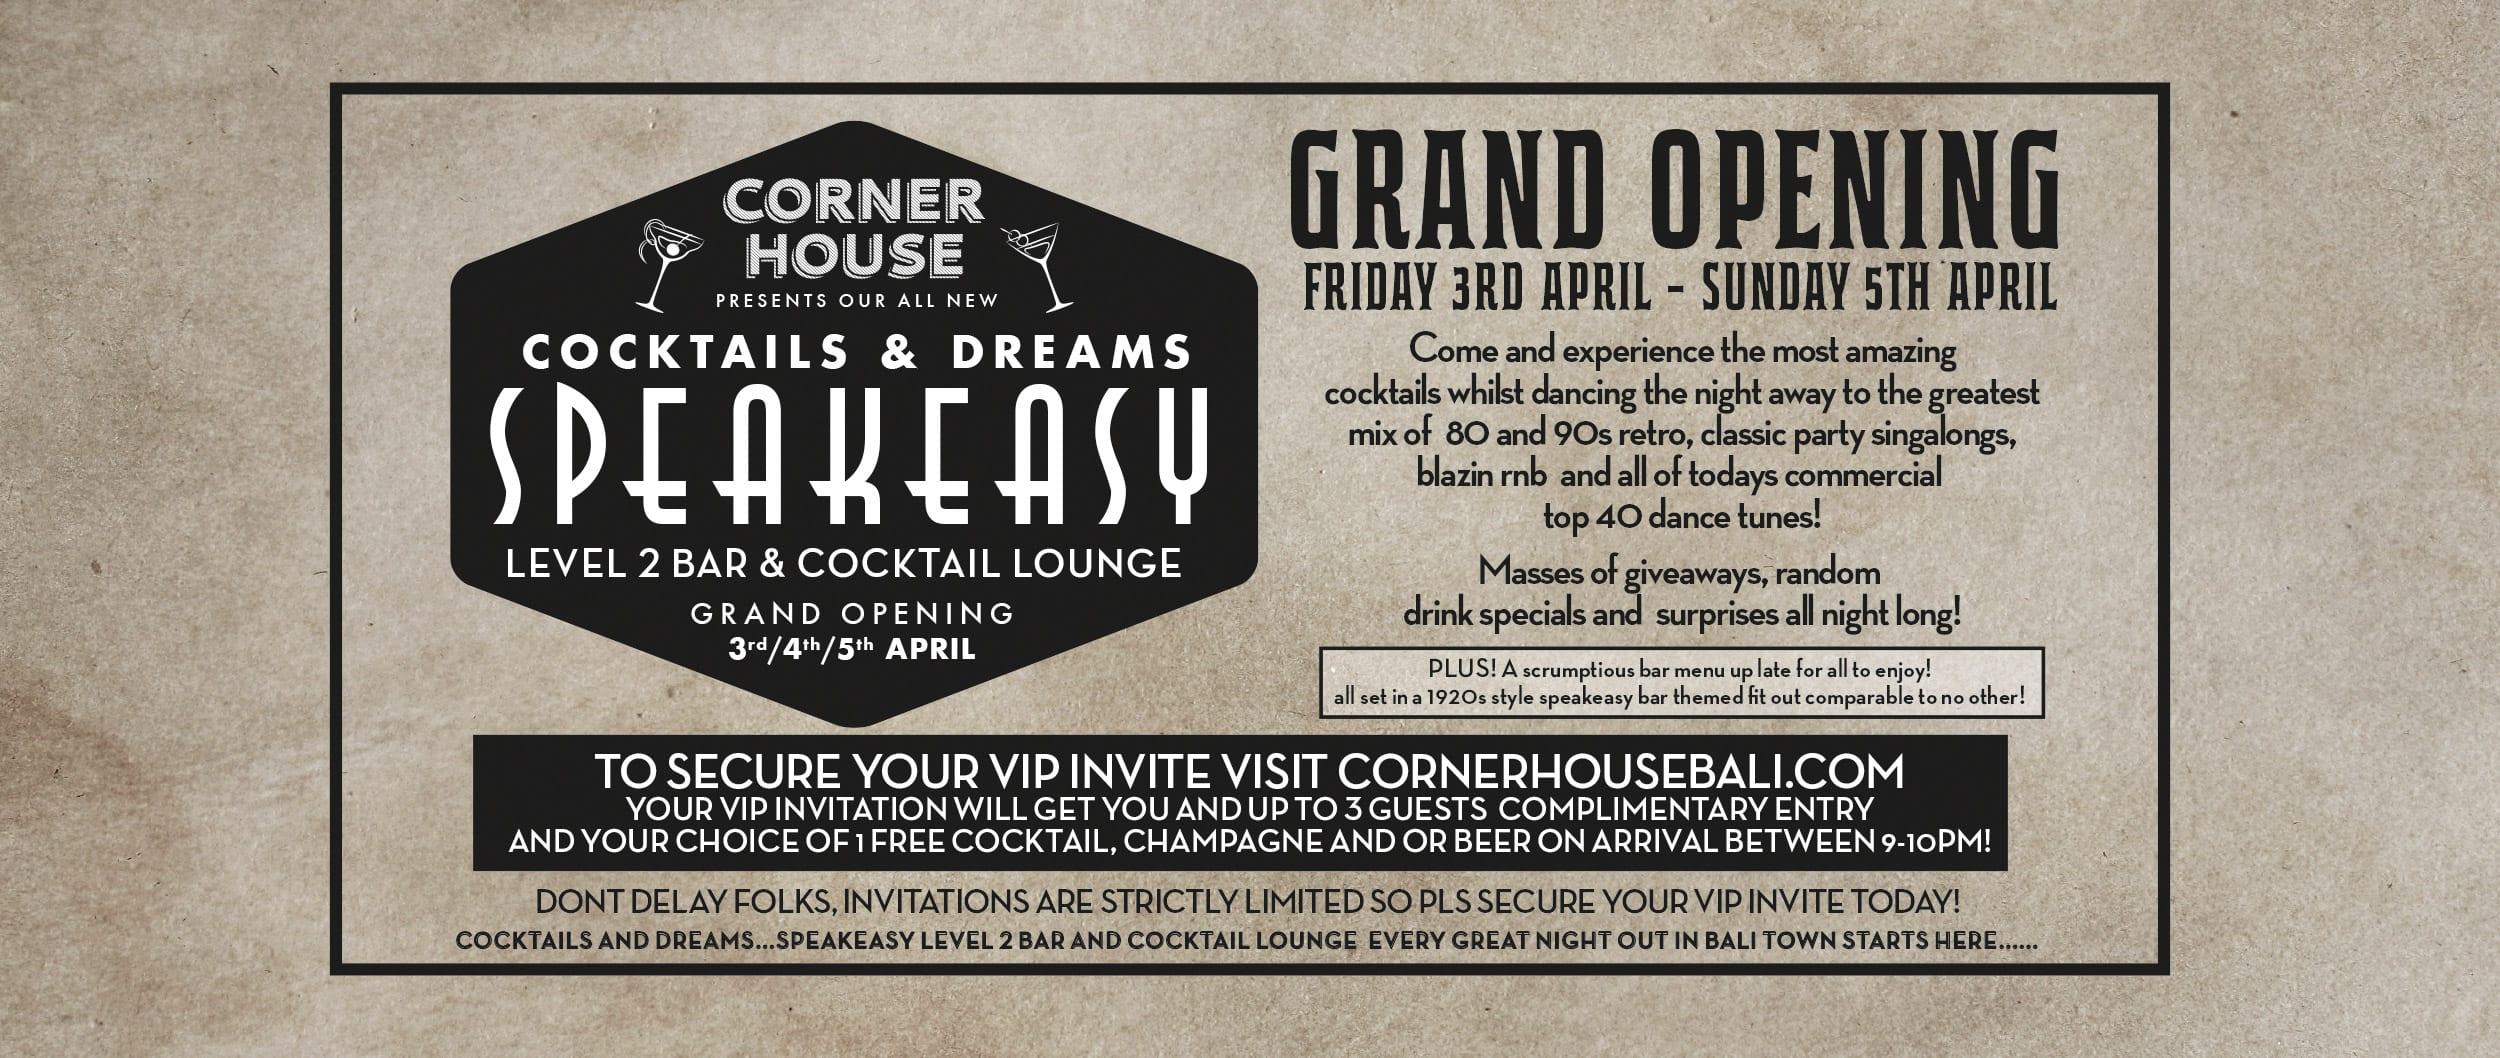 Grand Opening of Speakeasy Level 2 Cocktail & Lounge Bar at Corner House Seminyak!